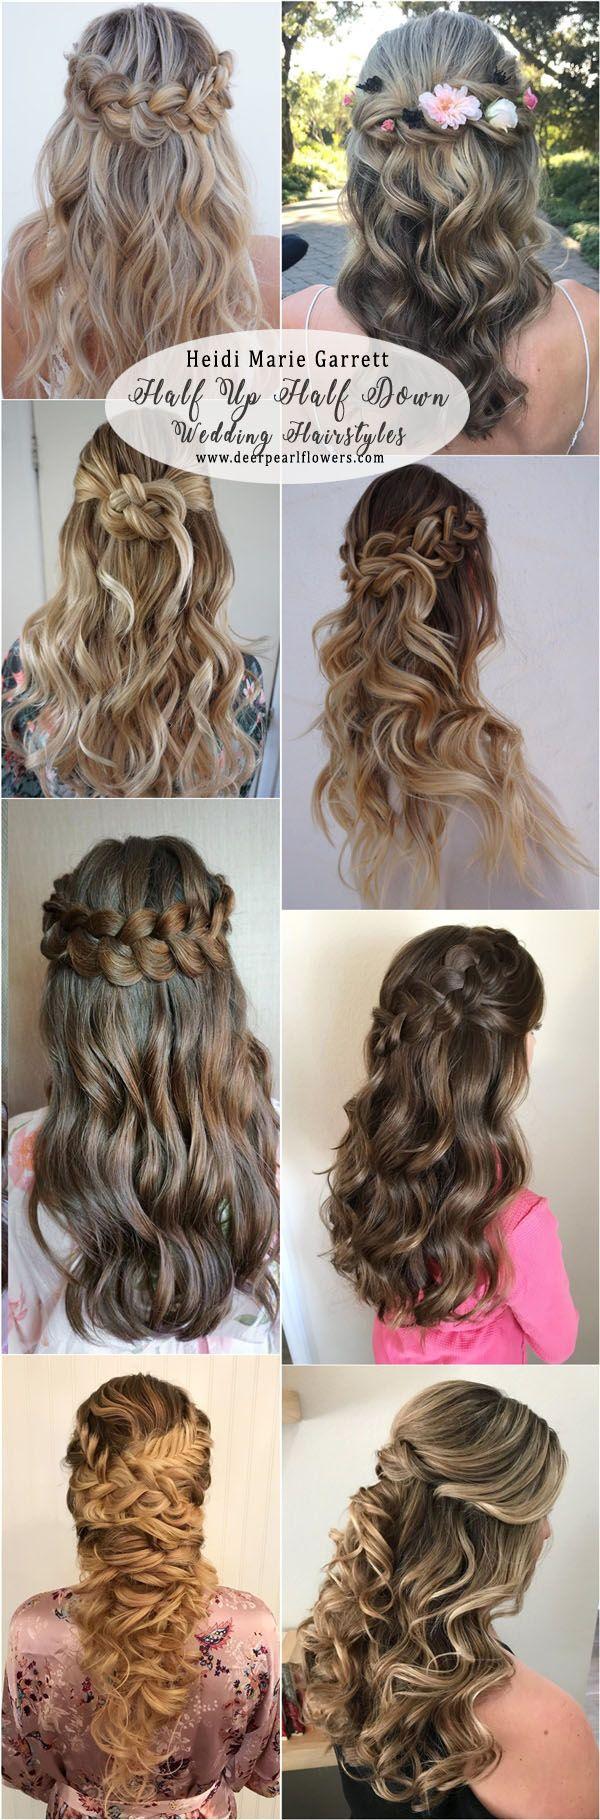 Wedding Hairstyles Ideas : Heidi Marie Garrett Half up half down ...